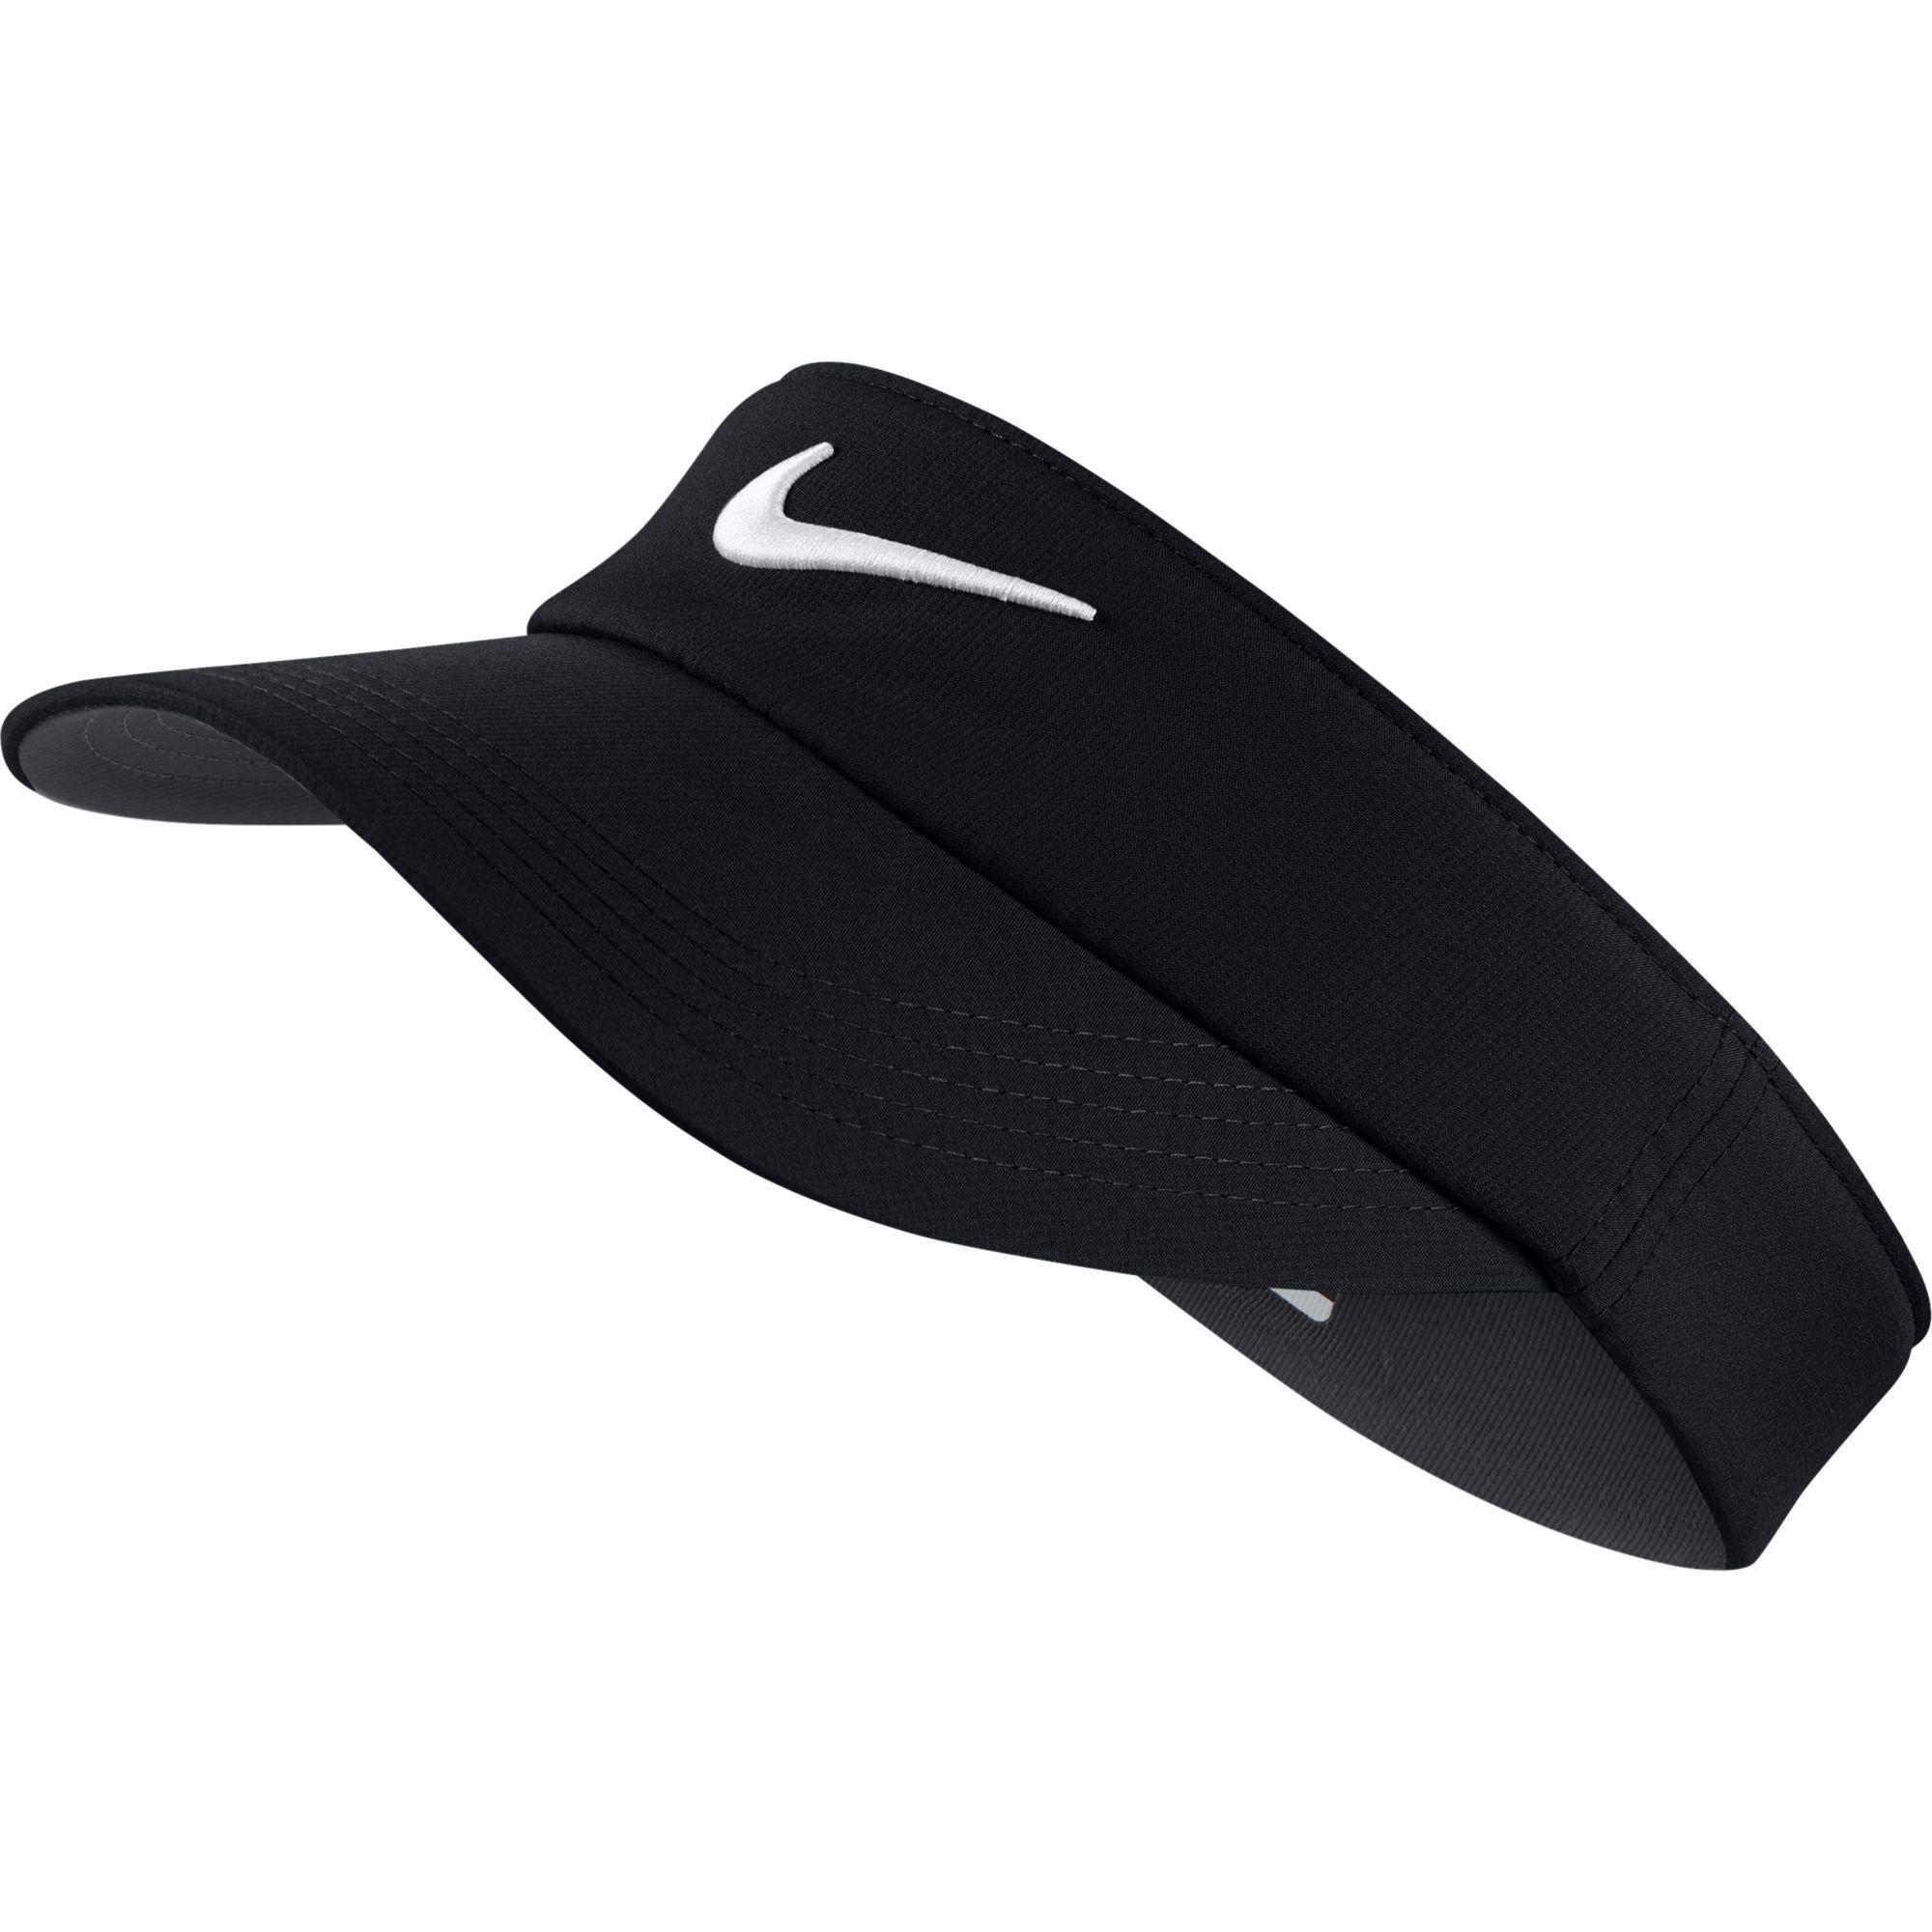 Men Golf Clothing - NIKE Unisex Core Golf Visor Black Anthracite White One  Size 2a6b48747322